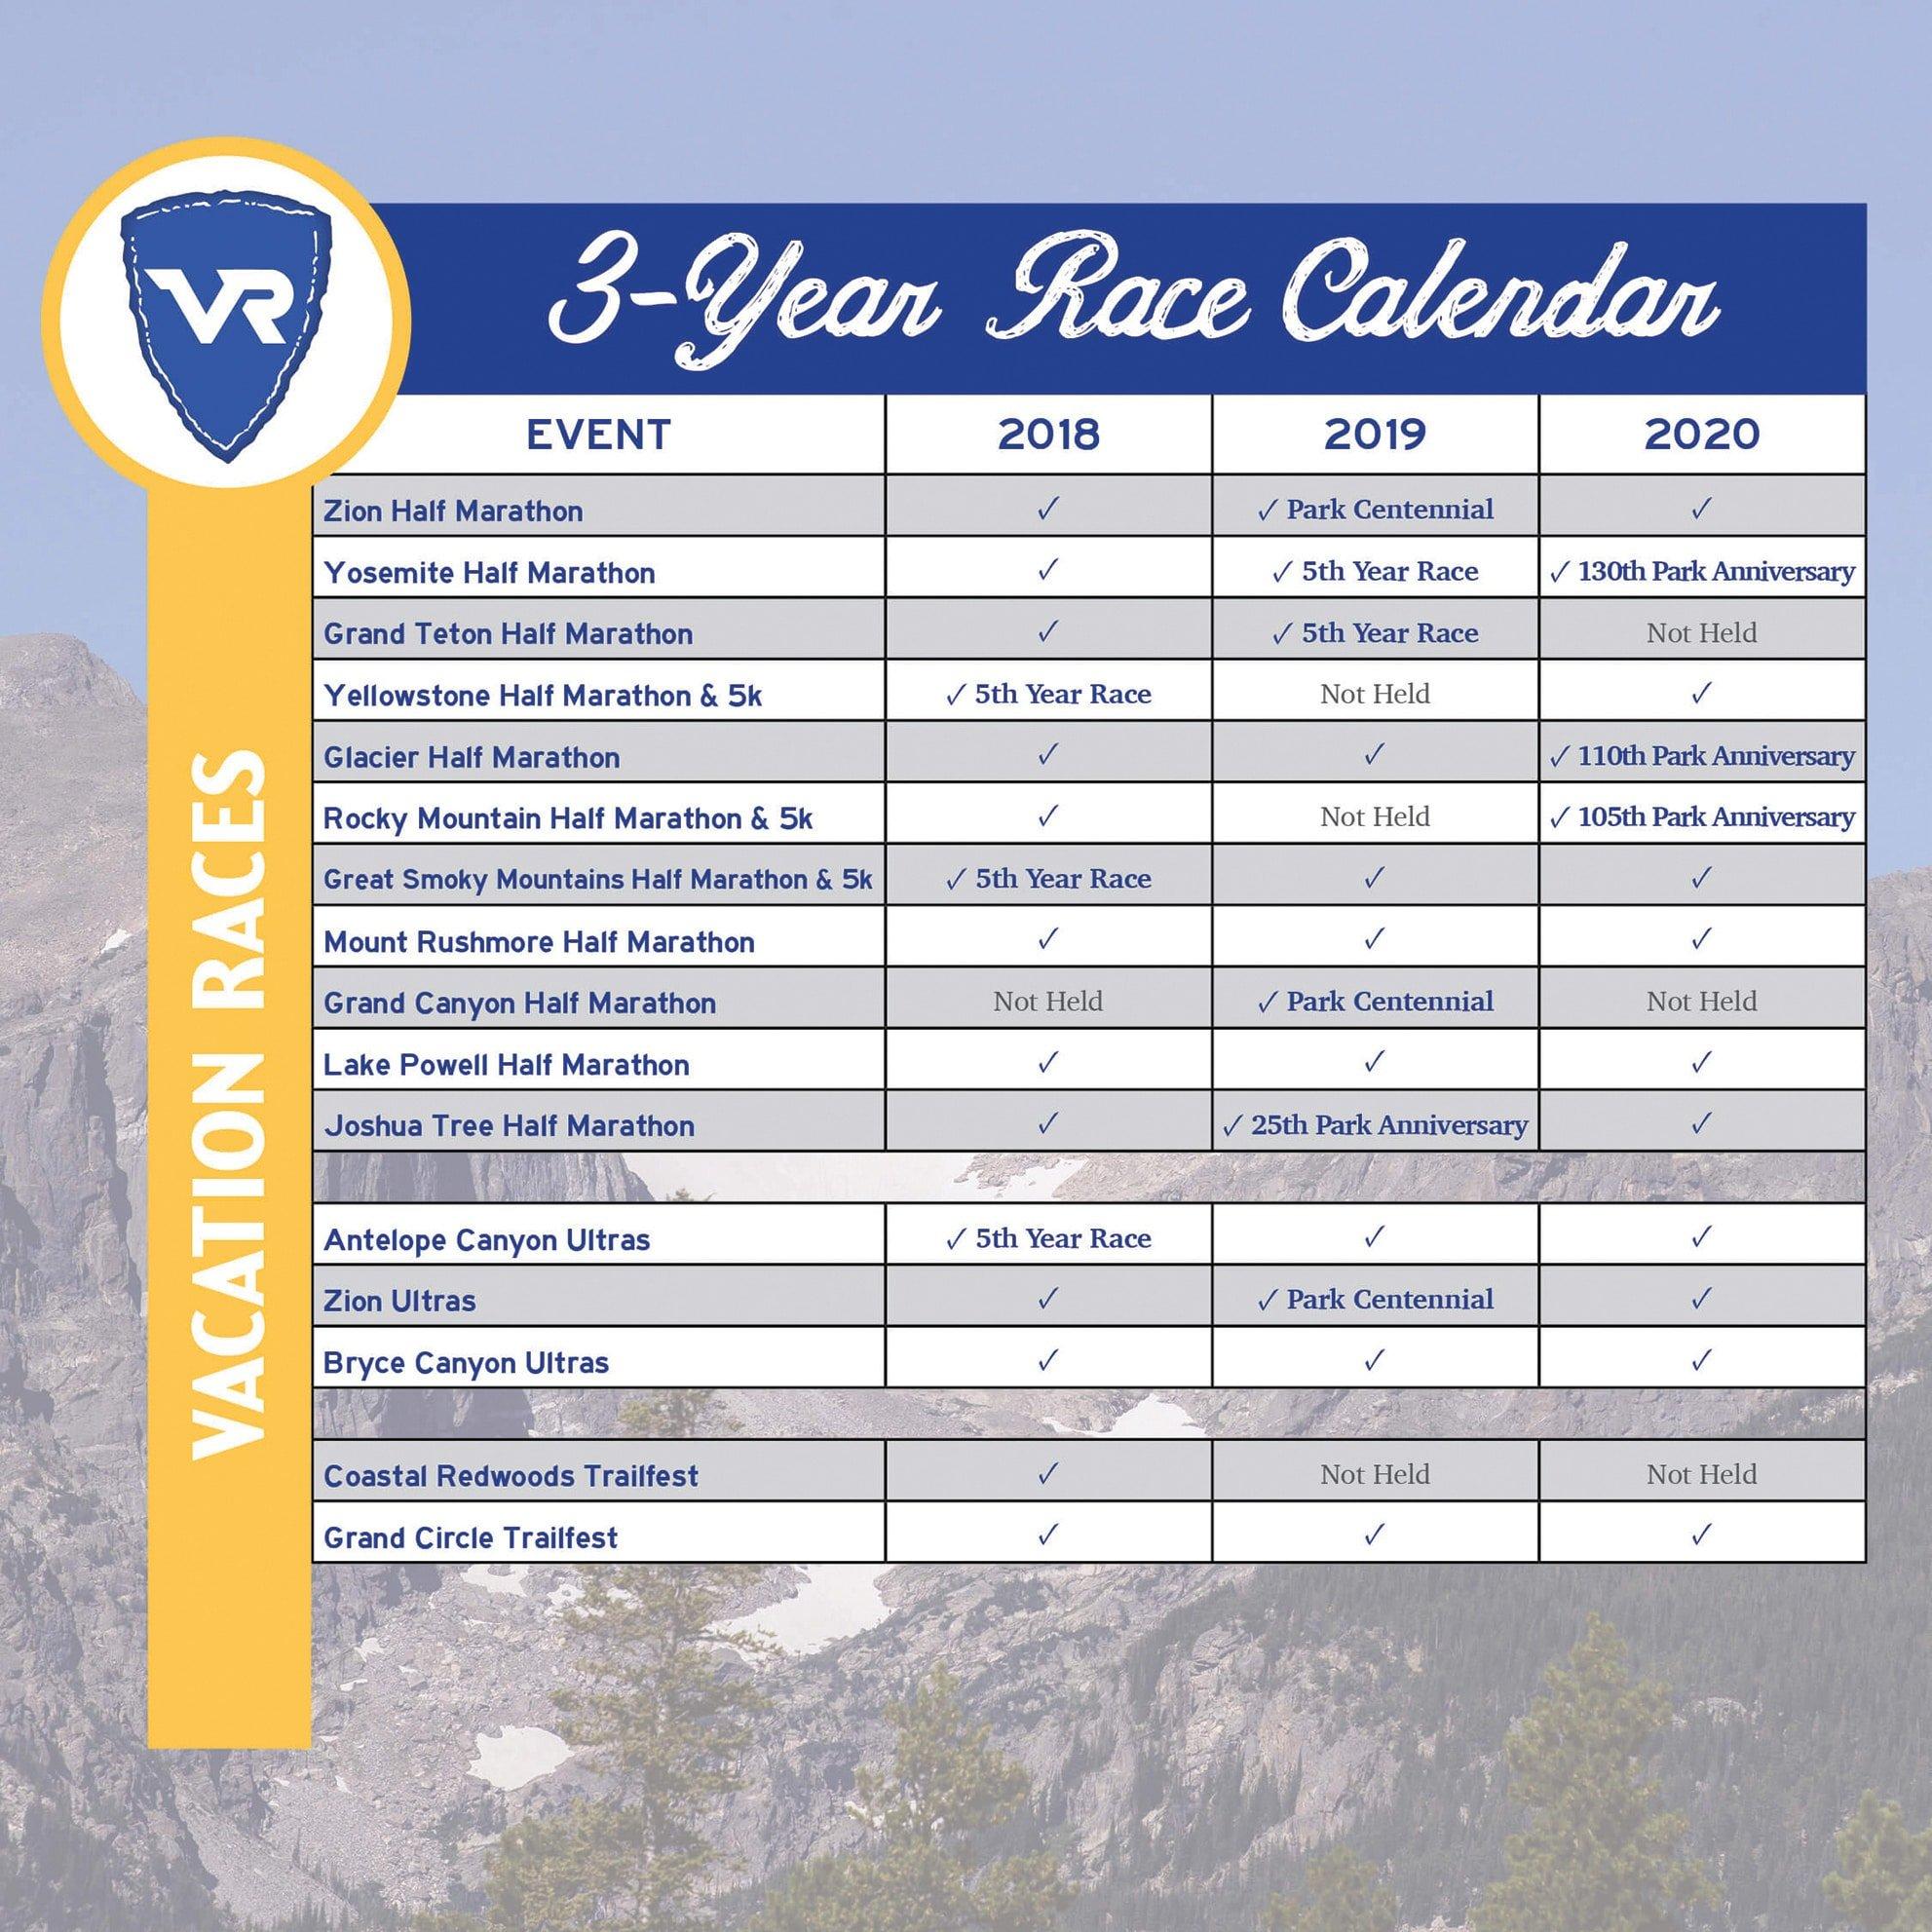 Race Calendar.Rotating Race Schedules Extended Calendar And New Race Logos